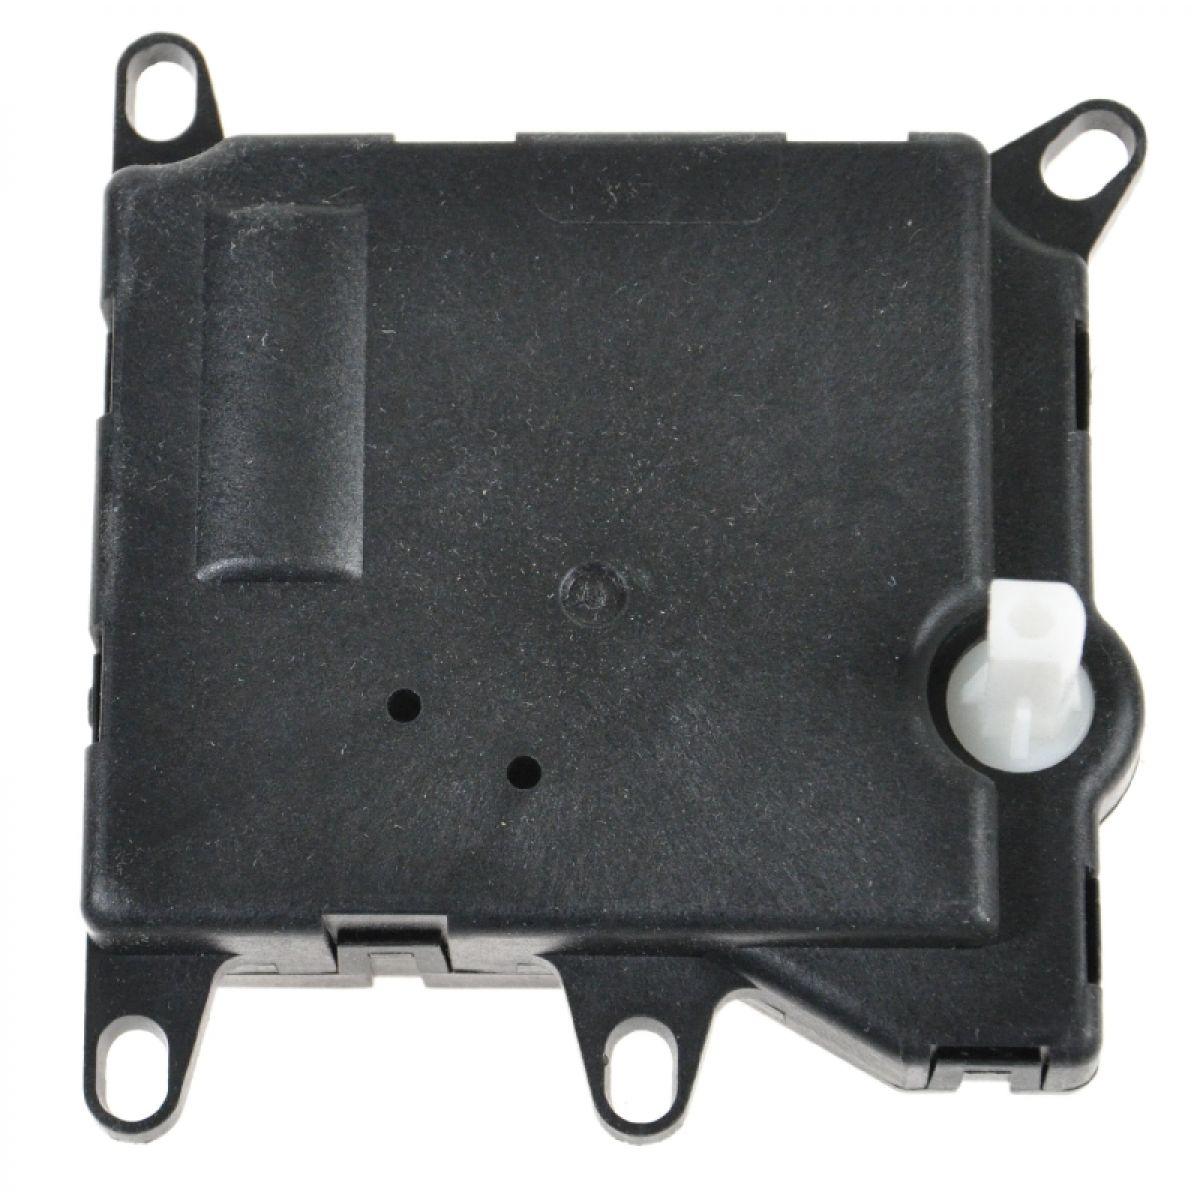 2000 Ford Ranger Door Parts Diagram Wiring Diagram Photos For Help